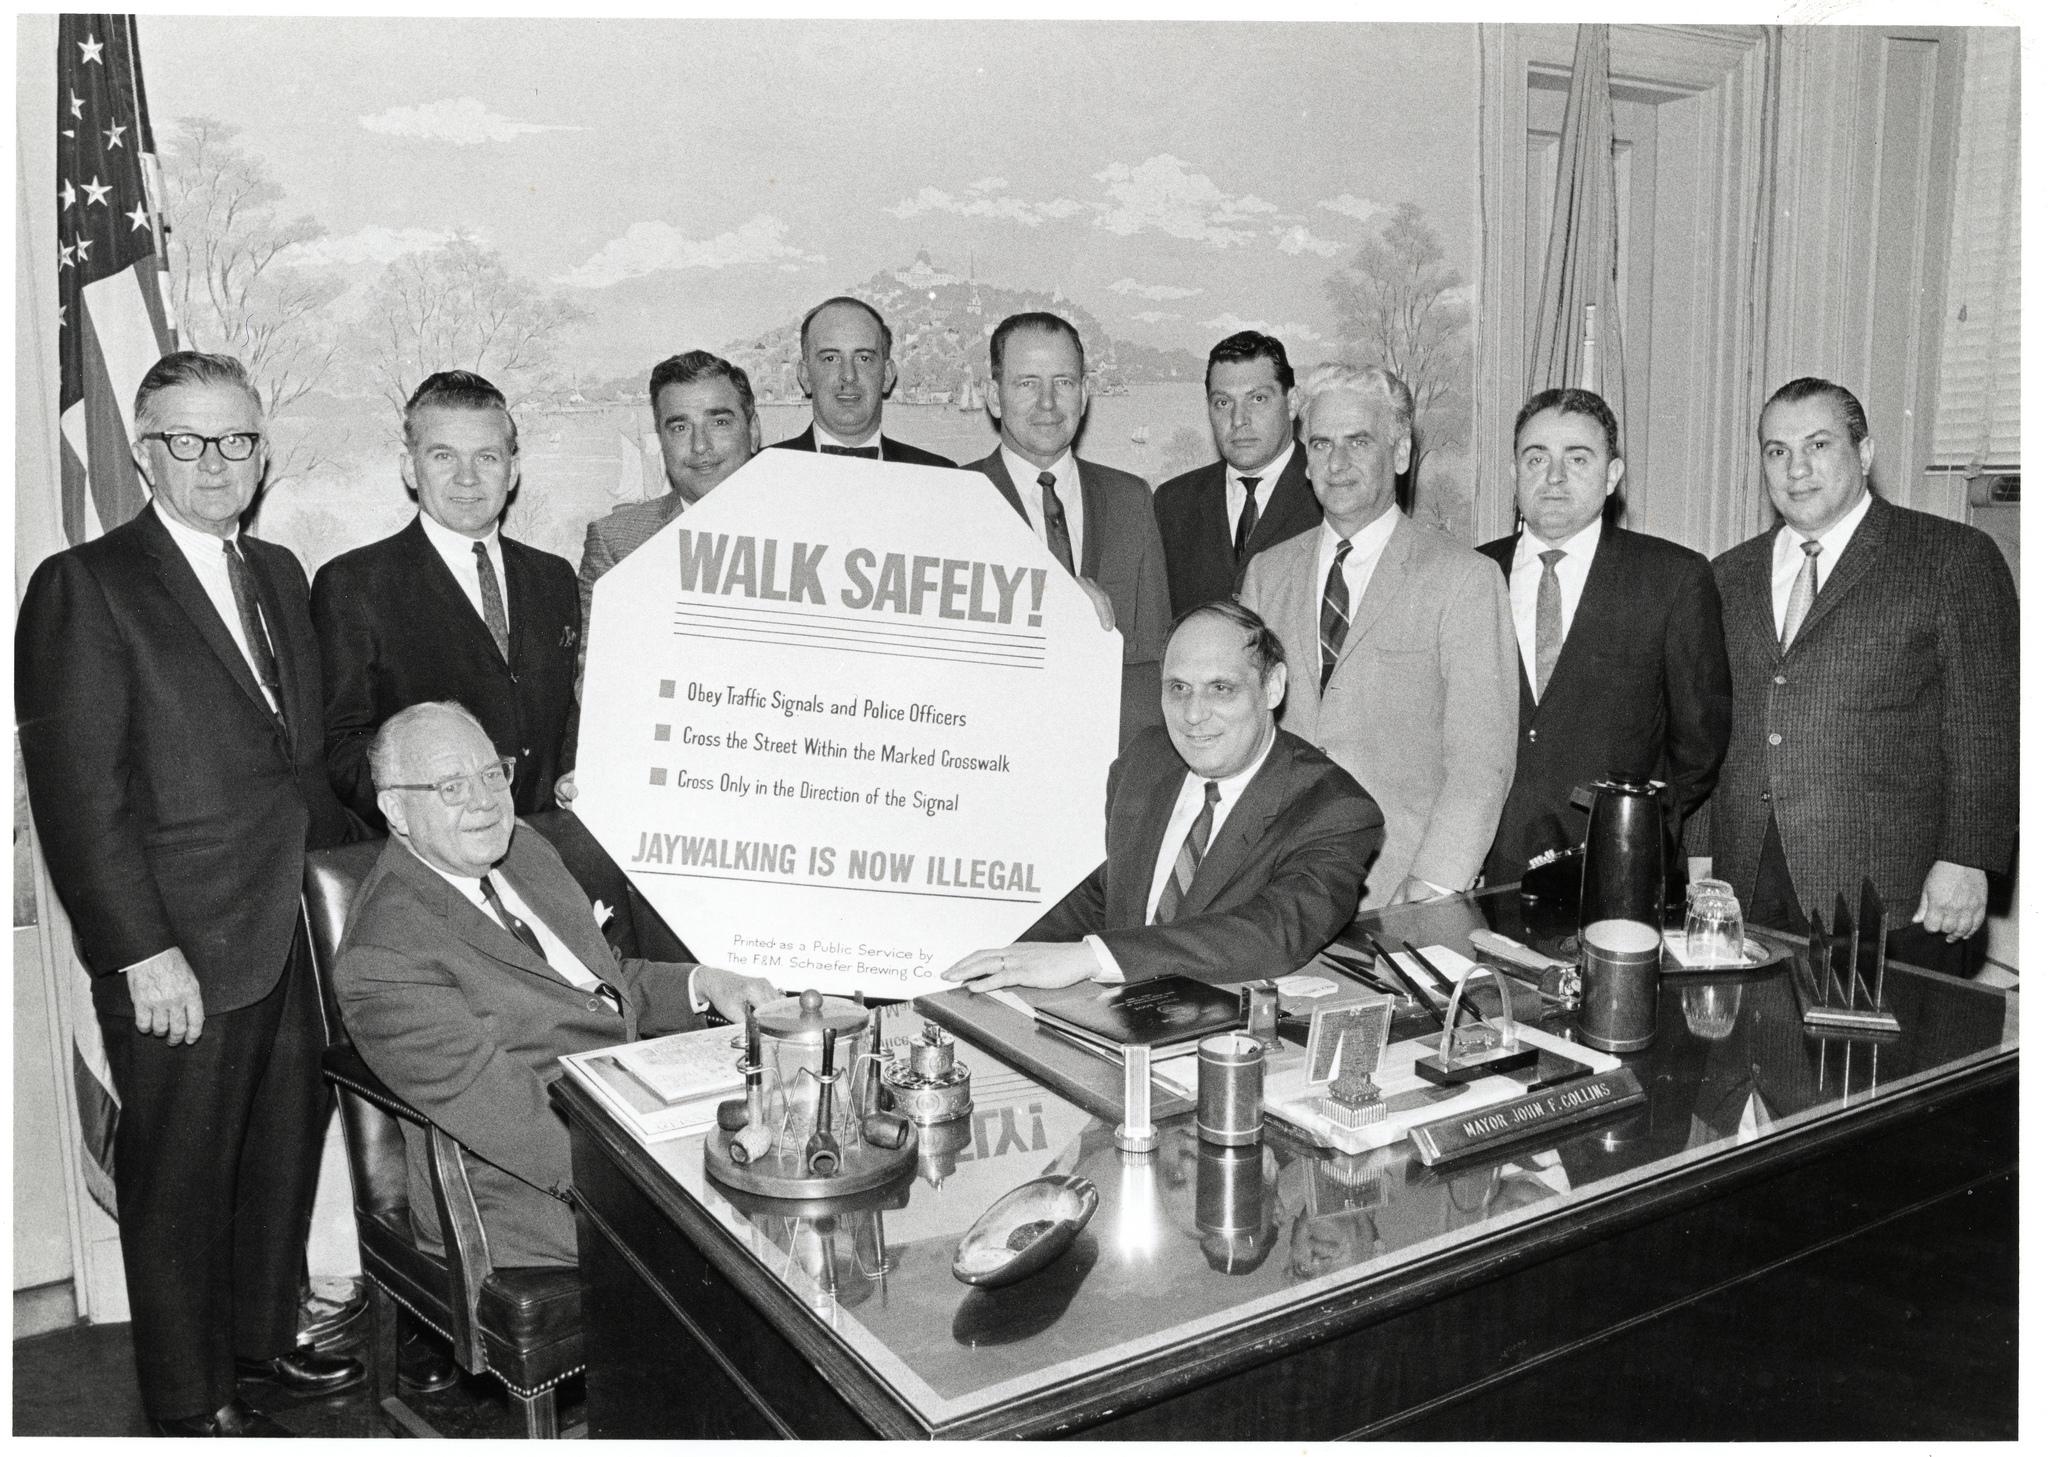 Prefeitura de Boston proibindo o jaywalking nos anos 1960. Foto: cityofbostonarchives @ Flickr